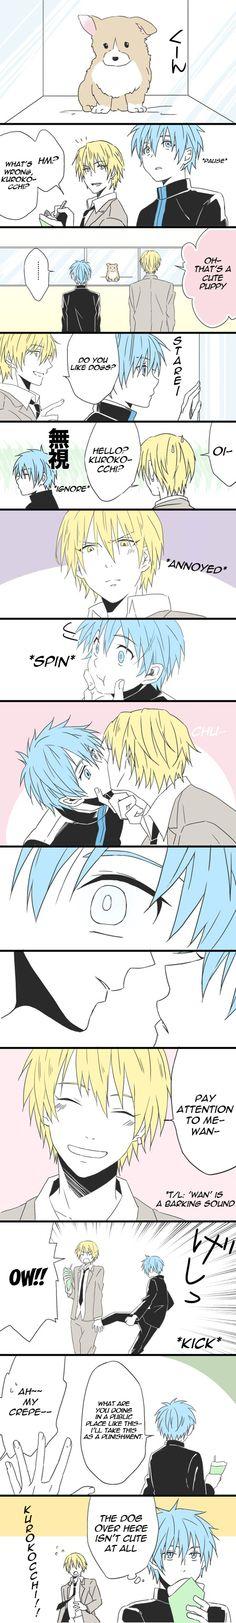 Ahahahhahha... but Kurokocchi, Kise is a big sweet dog ^^